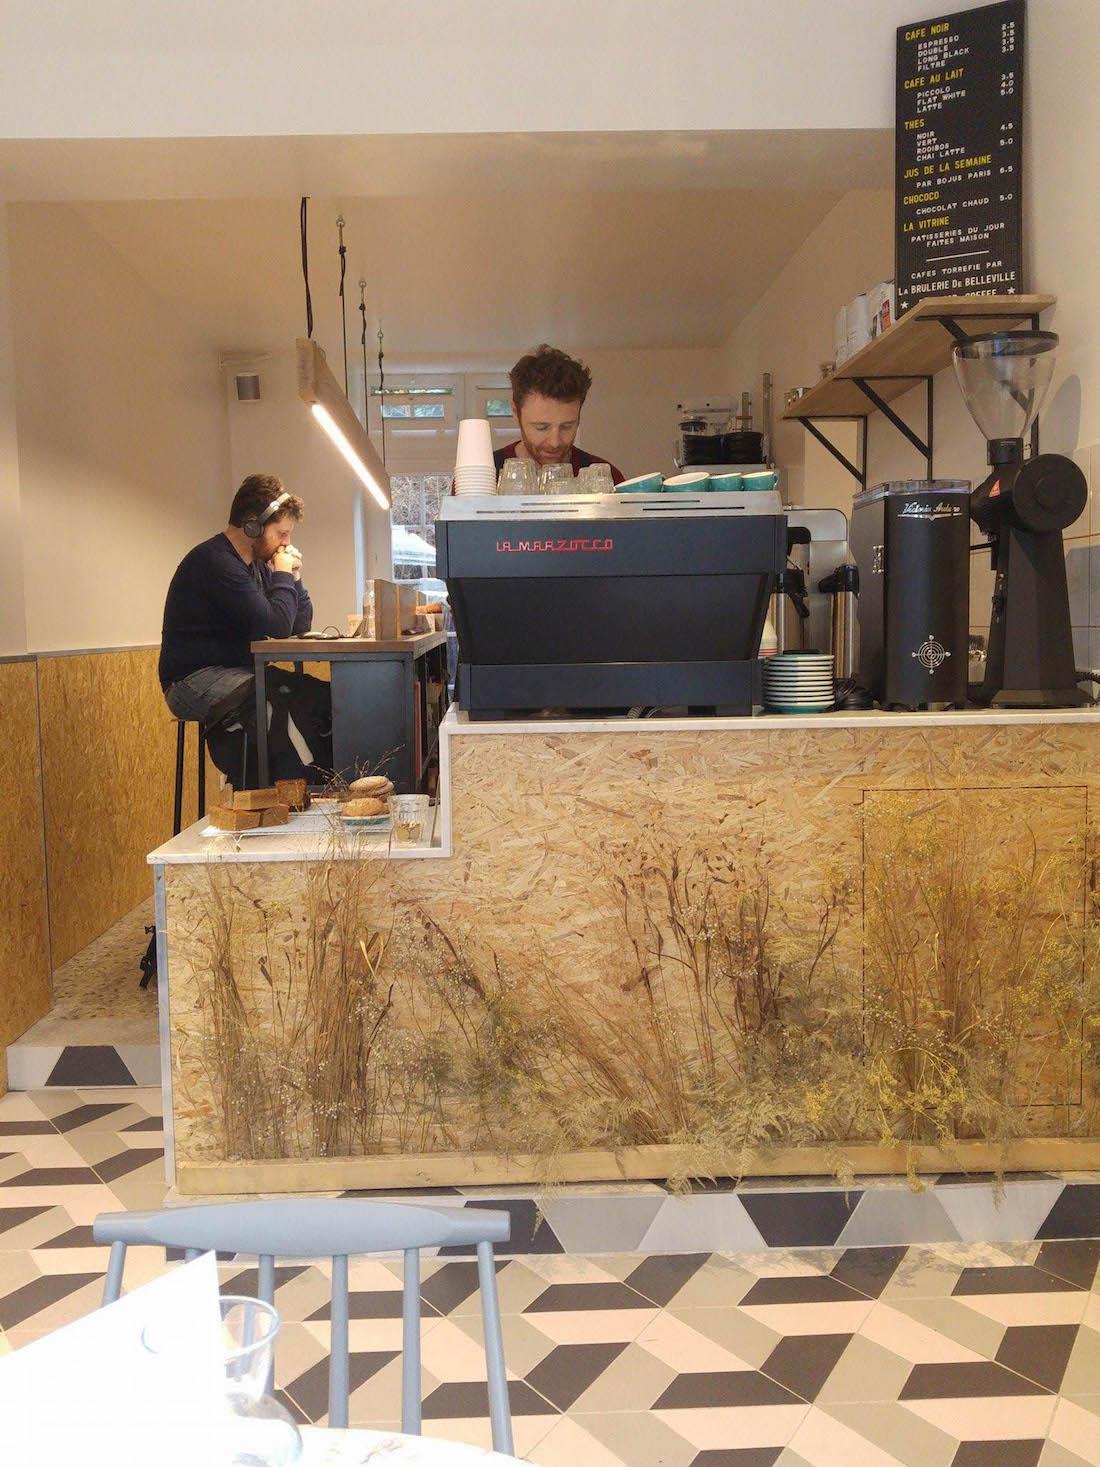 o-coffeeshop-paris-15eme-lourmel